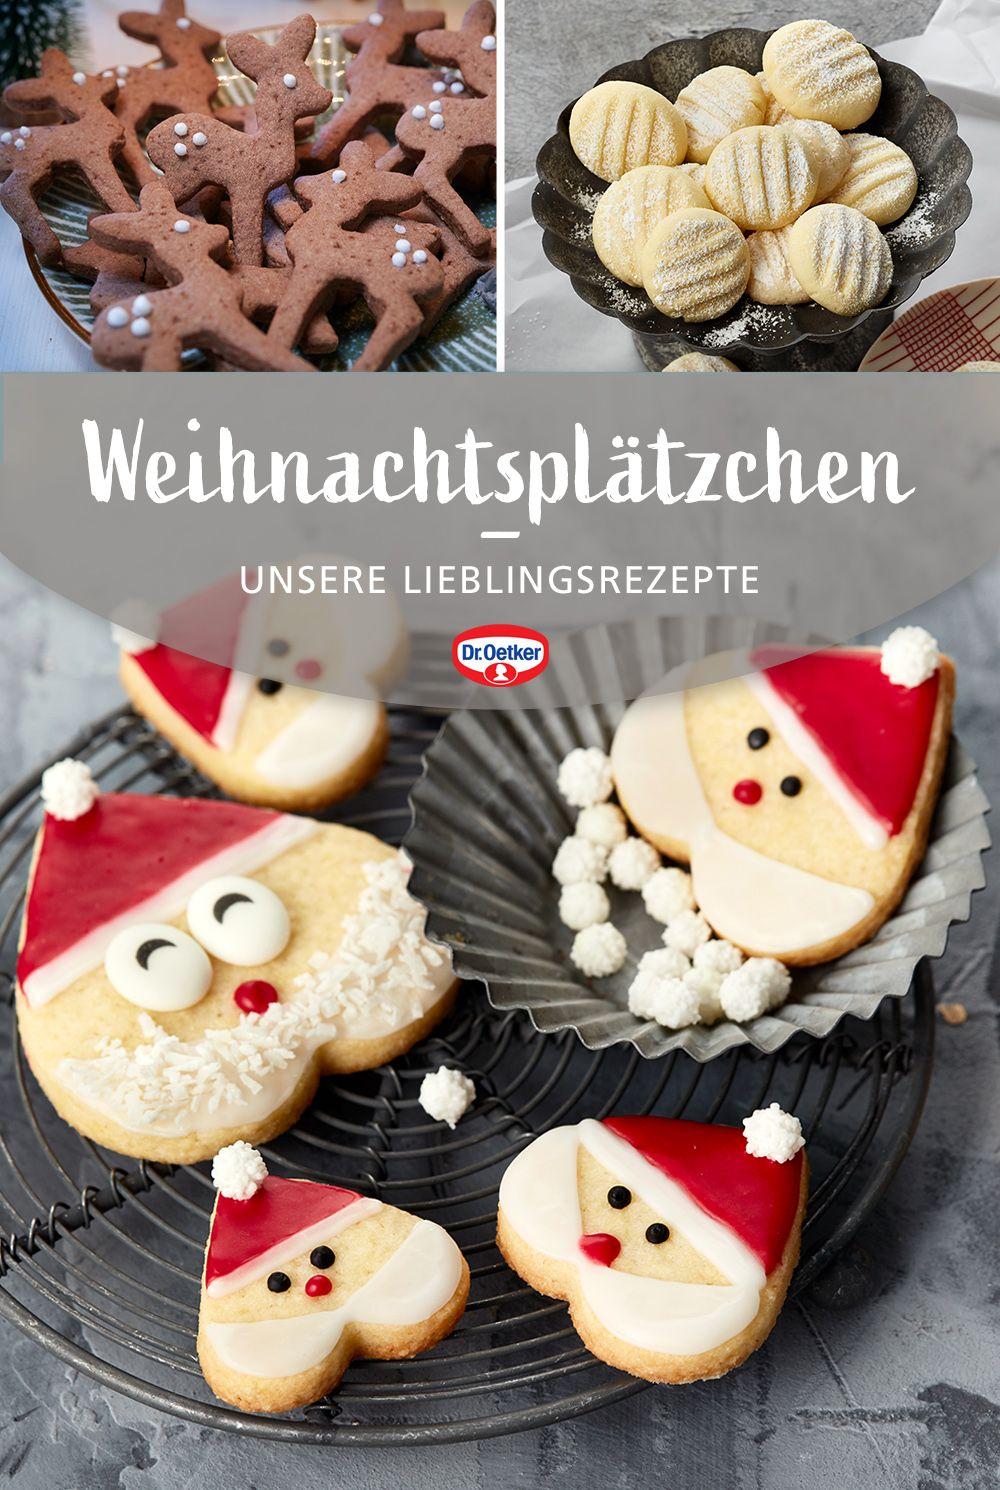 59f952271f02b7f2718dc9c17d9008f0 - Weihnachtszeit Rezepte